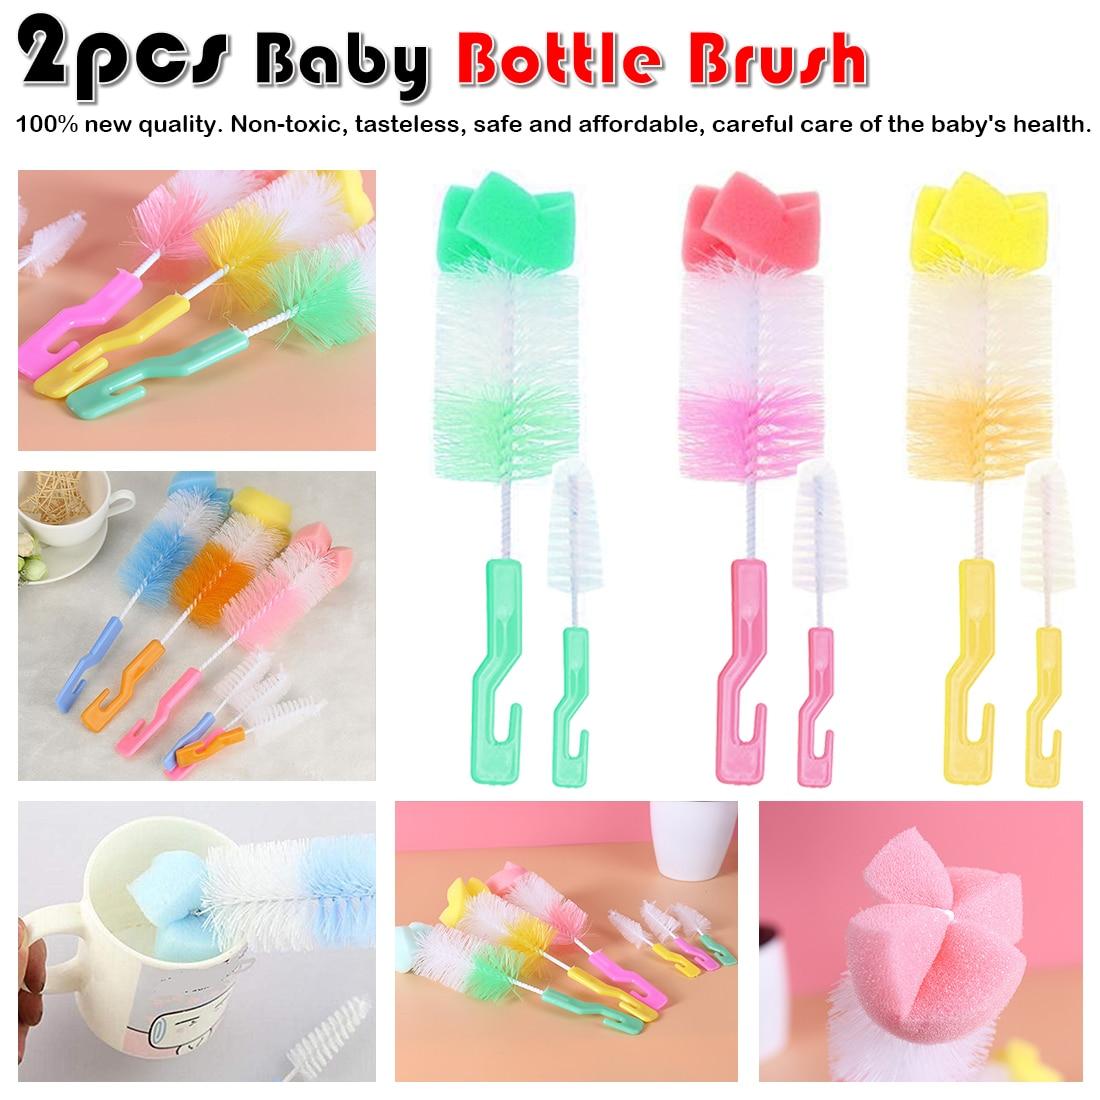 Random Color 2pc The Baby Bottle Brush Wash Bottle Bottle Nipple Brush Tool Sponge Cleaning Kit Baby Products Wholesale